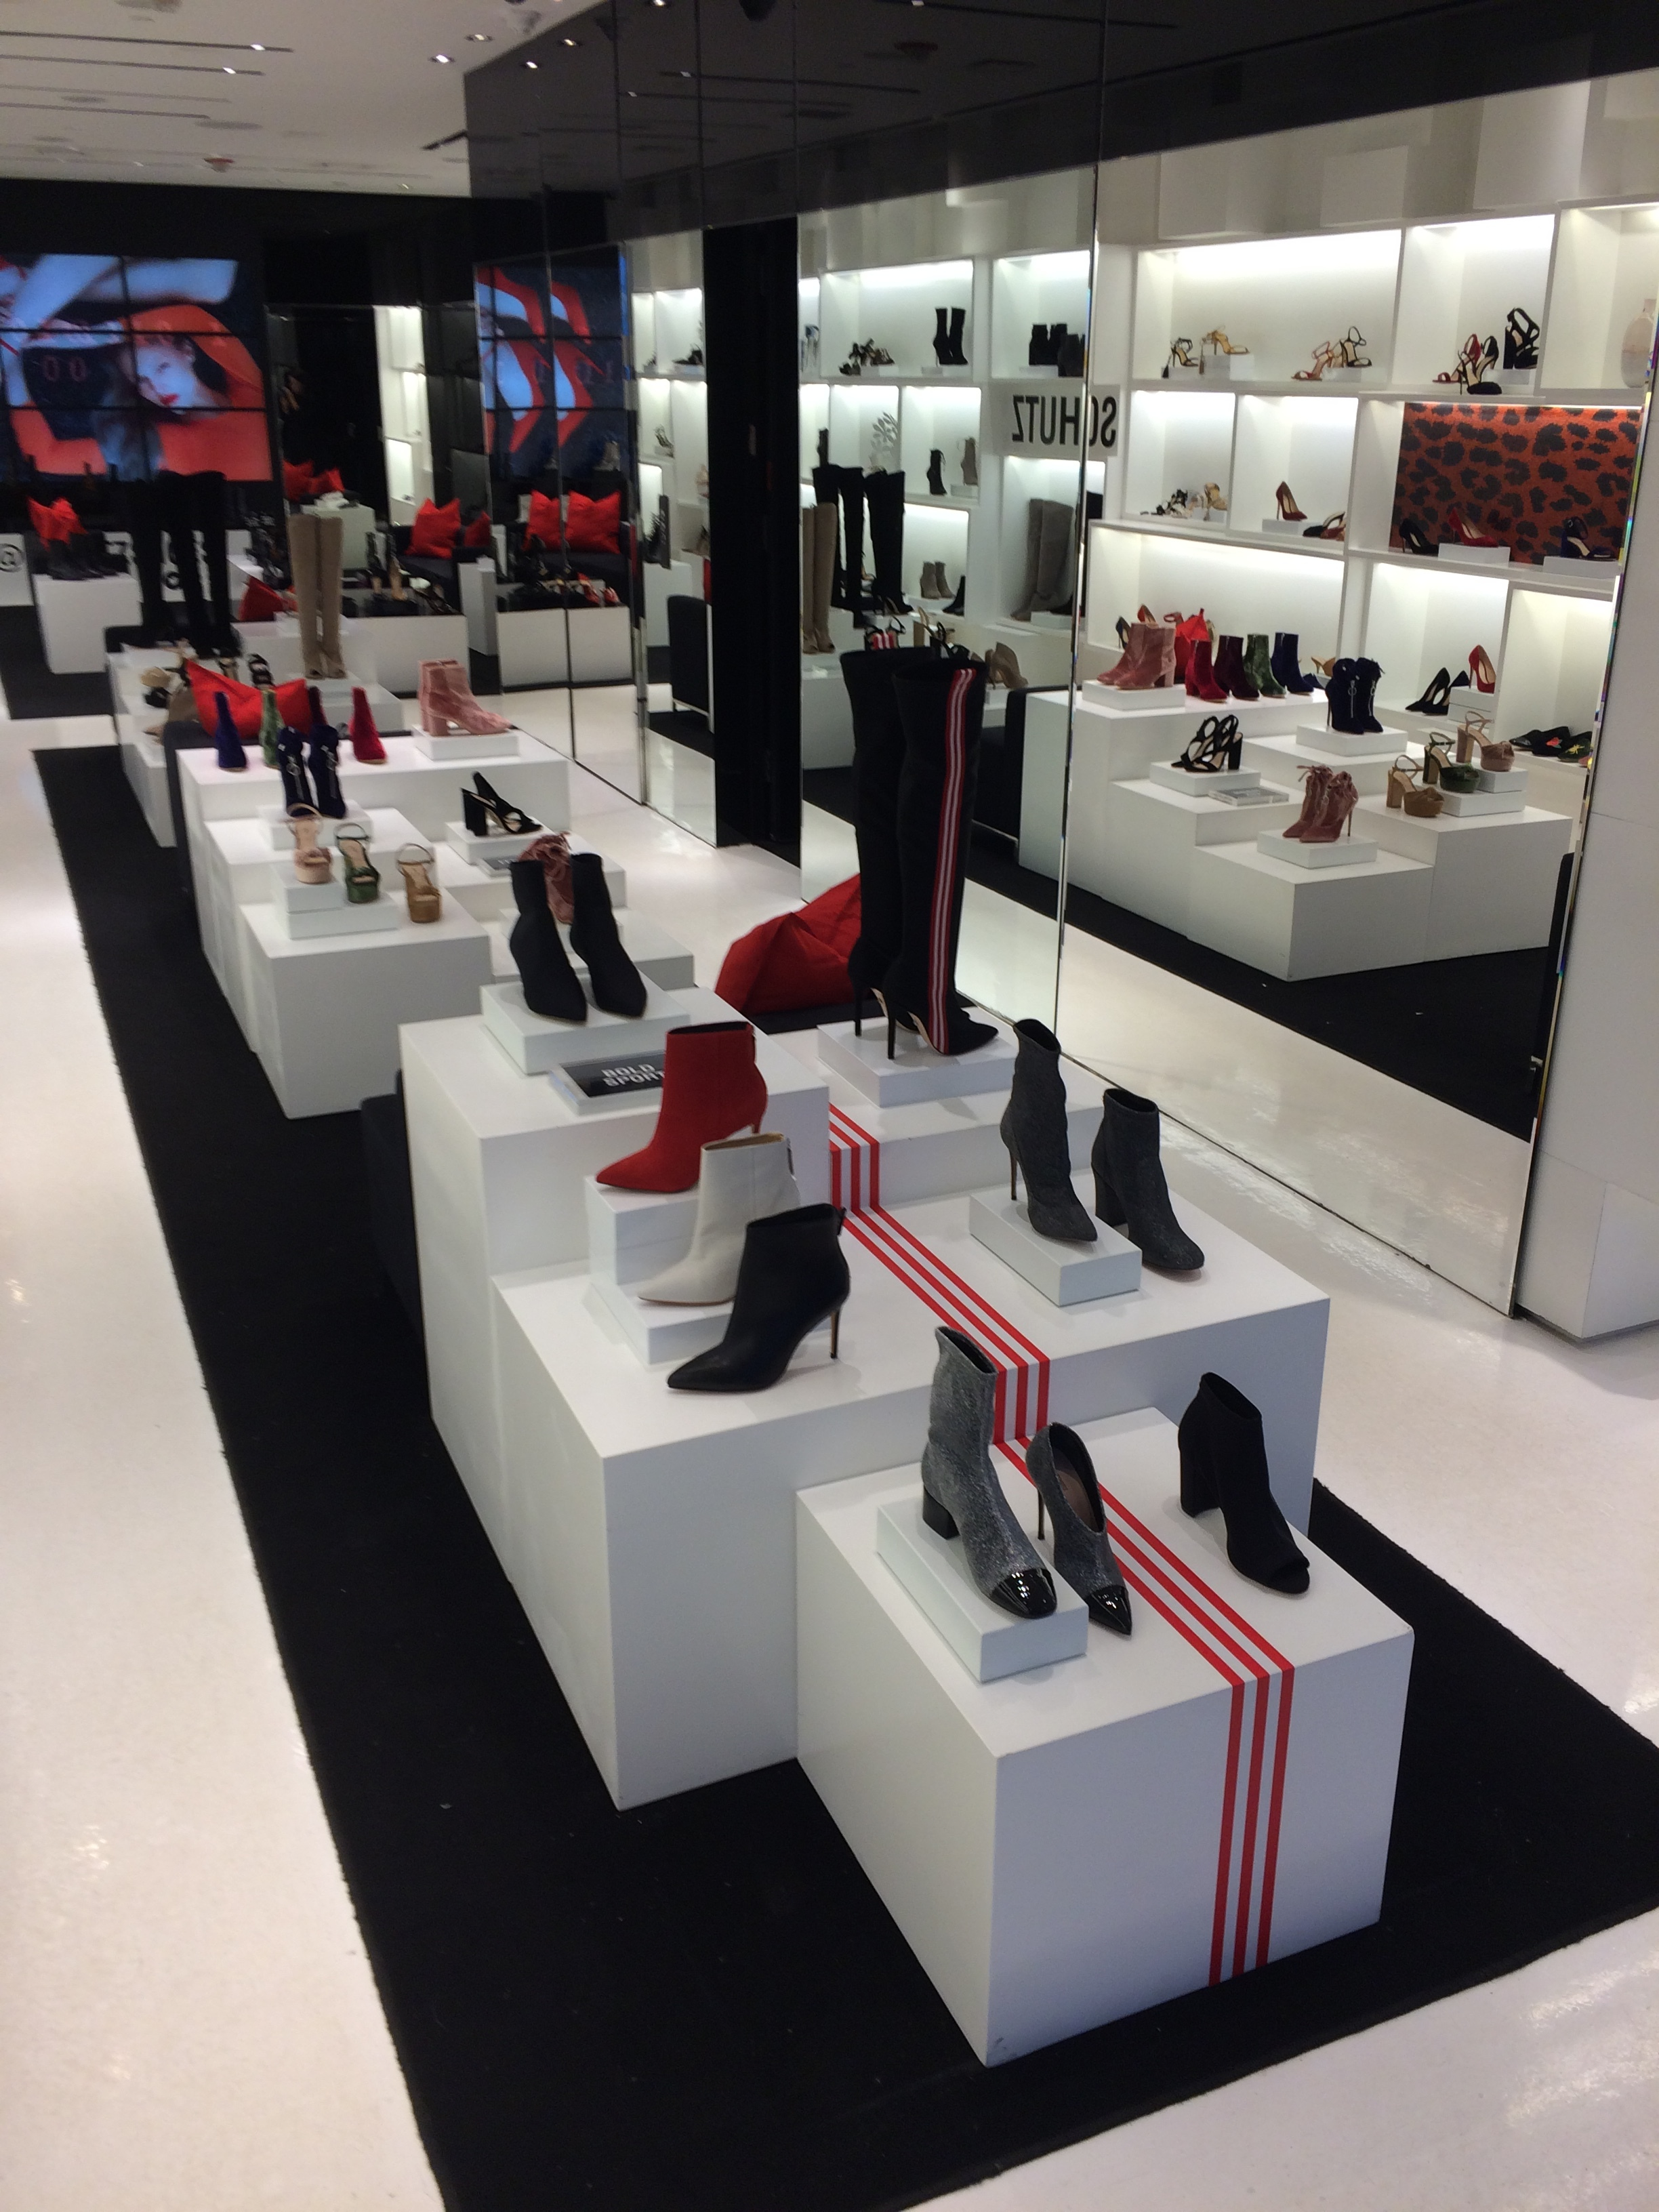 stores_10.JPG